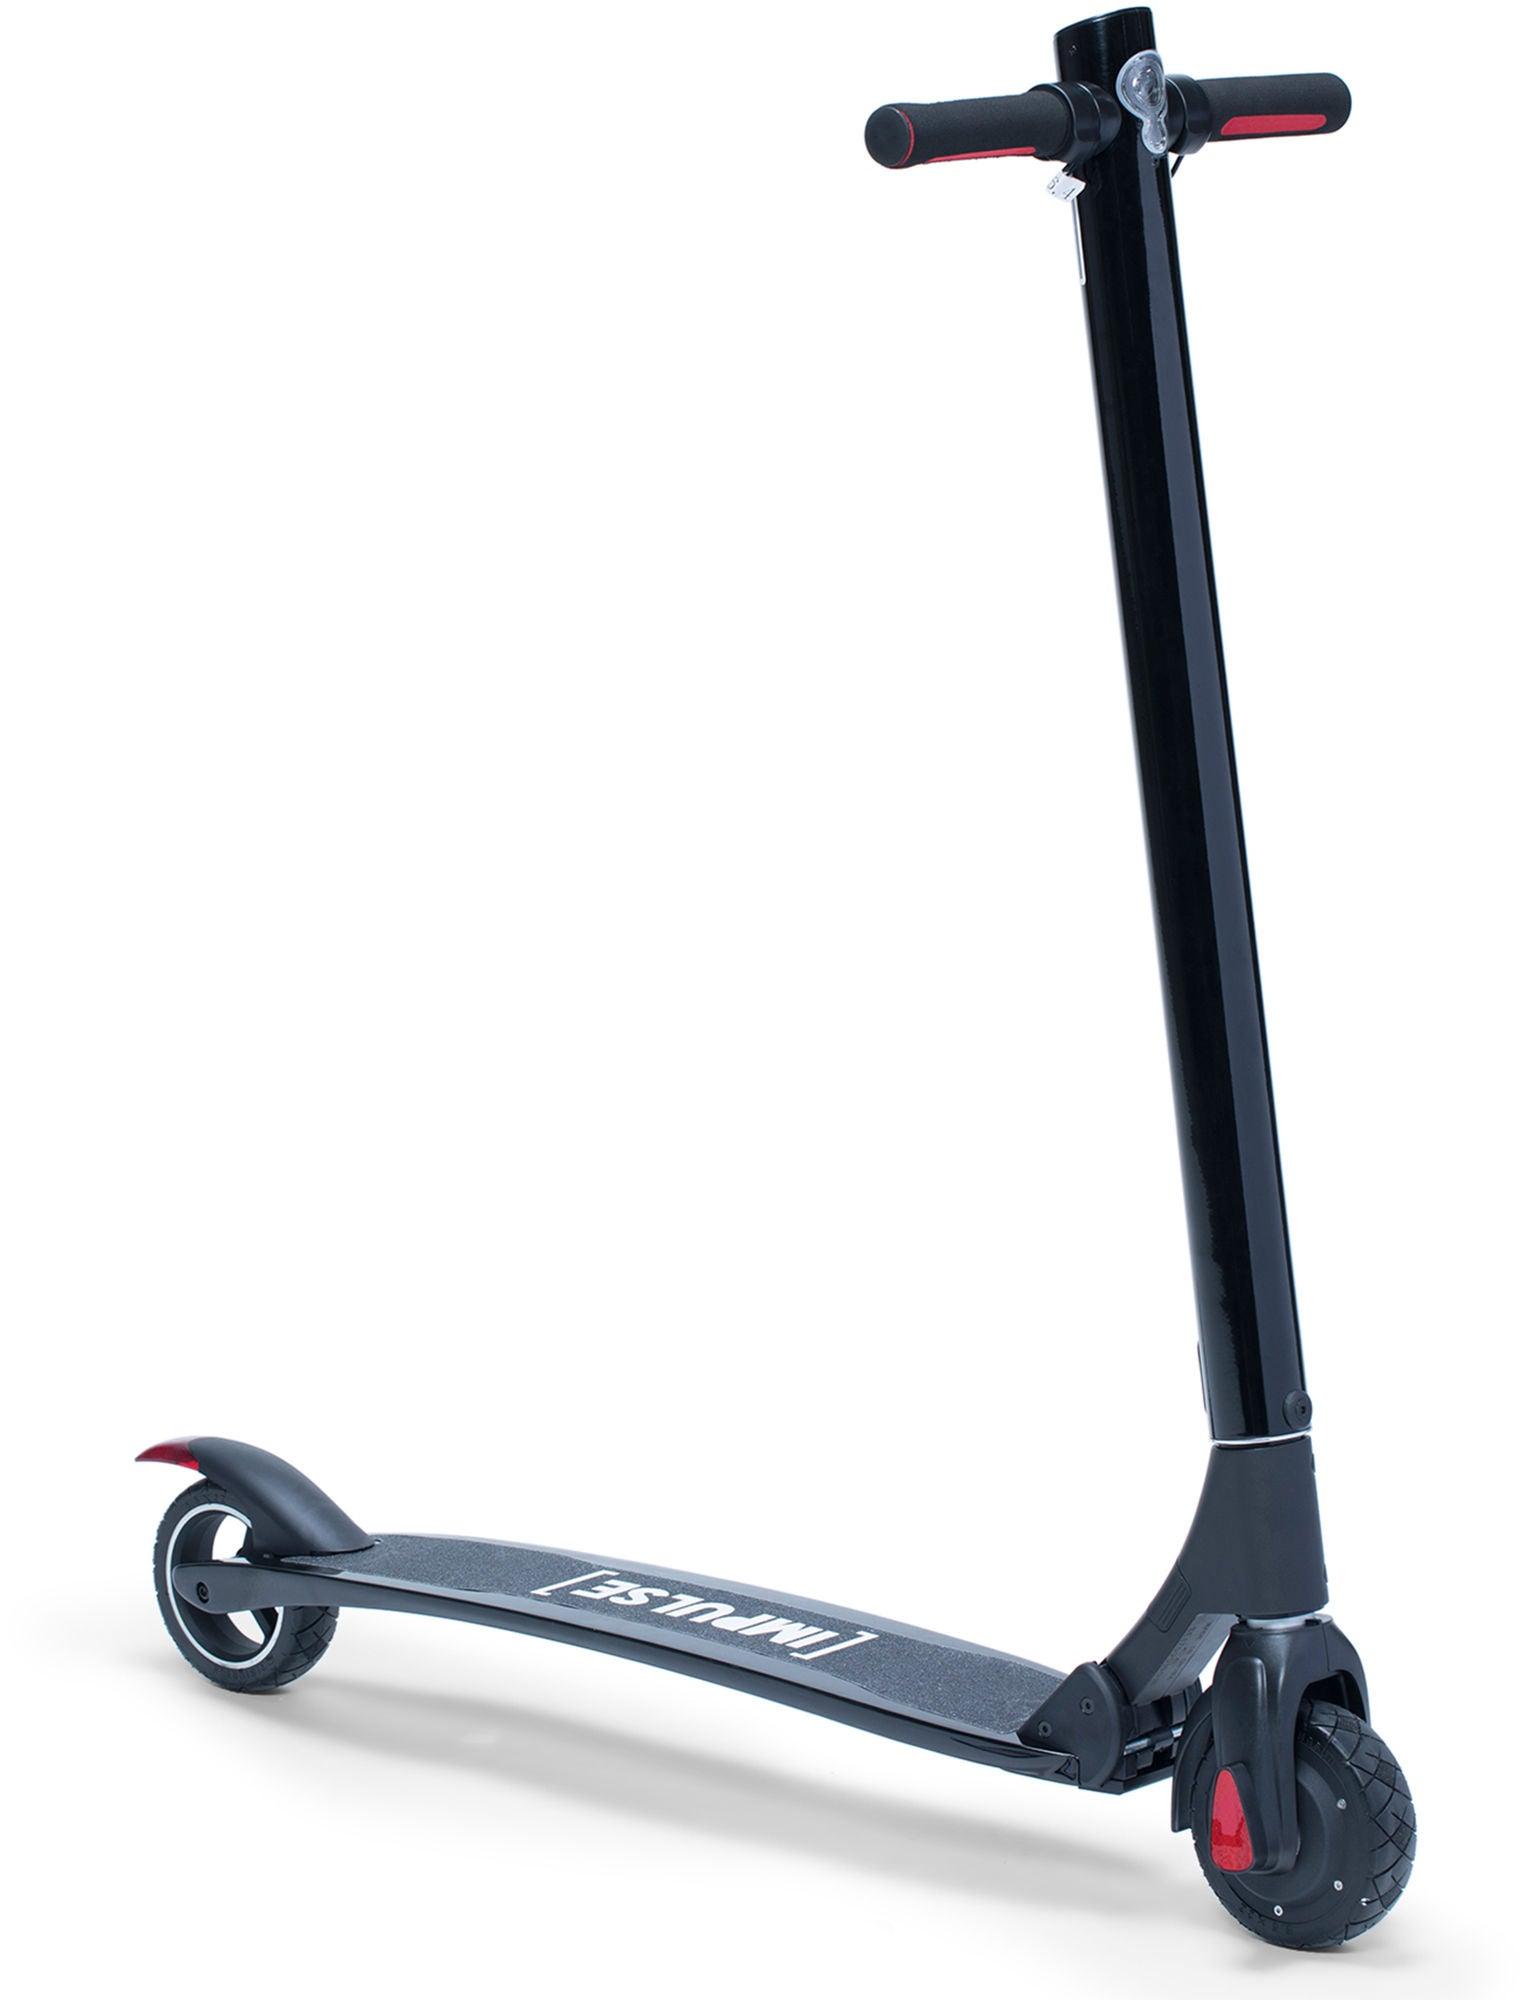 Impulse Carbon Fiber Elektrisk Sparkcykel, Svart